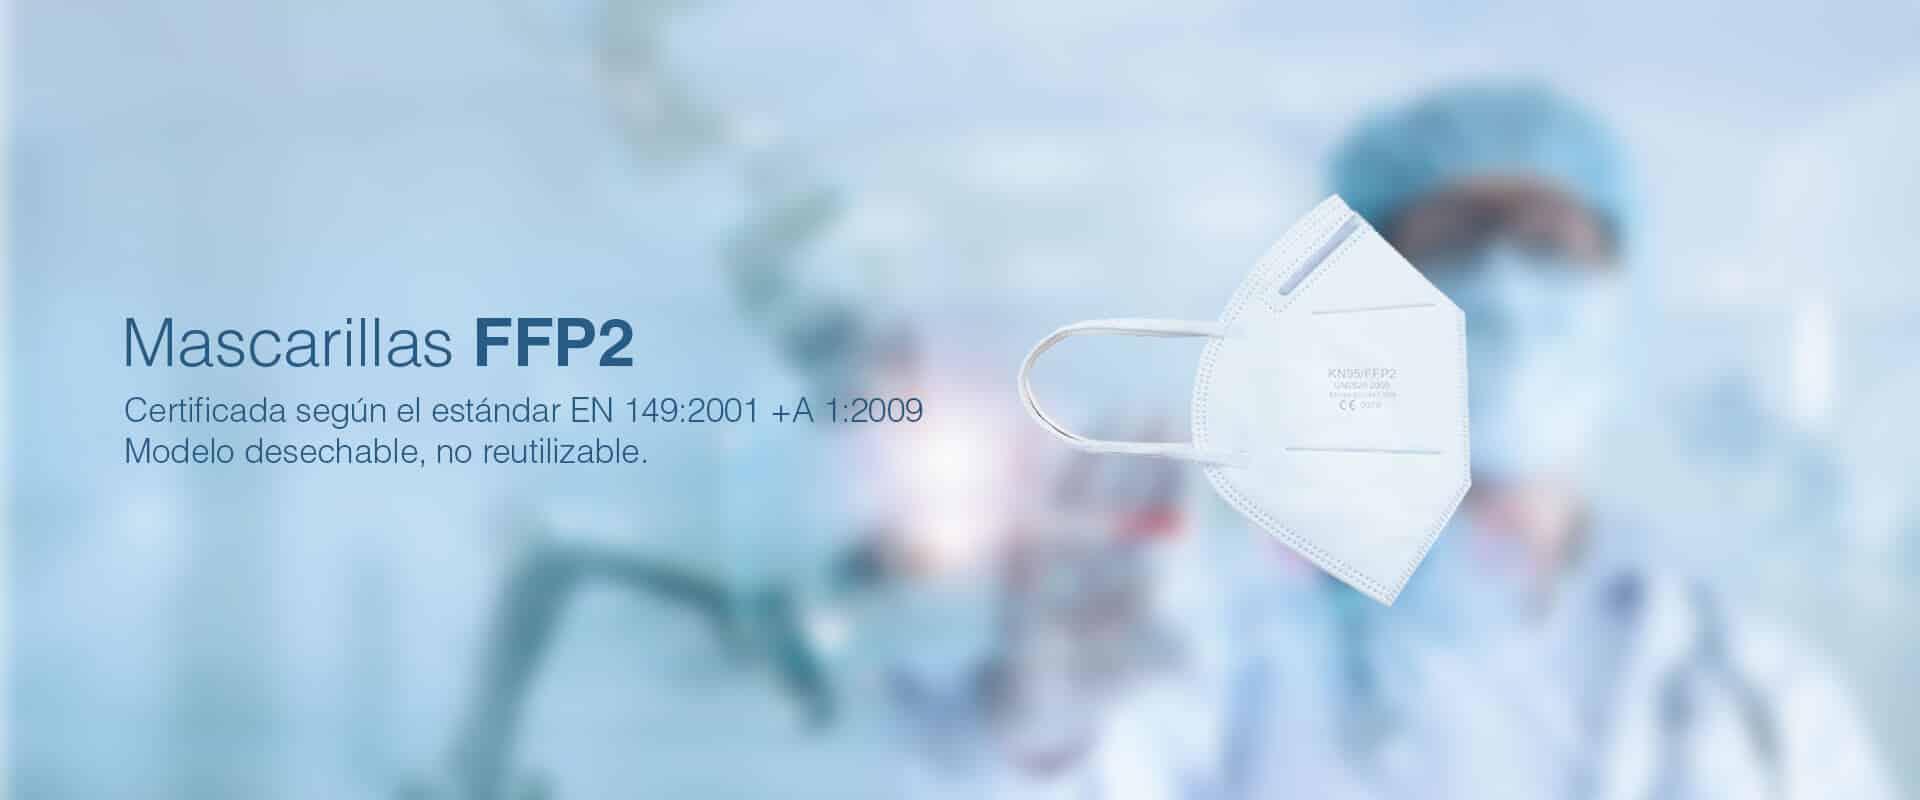 Mascarillas FFP2 - KN95